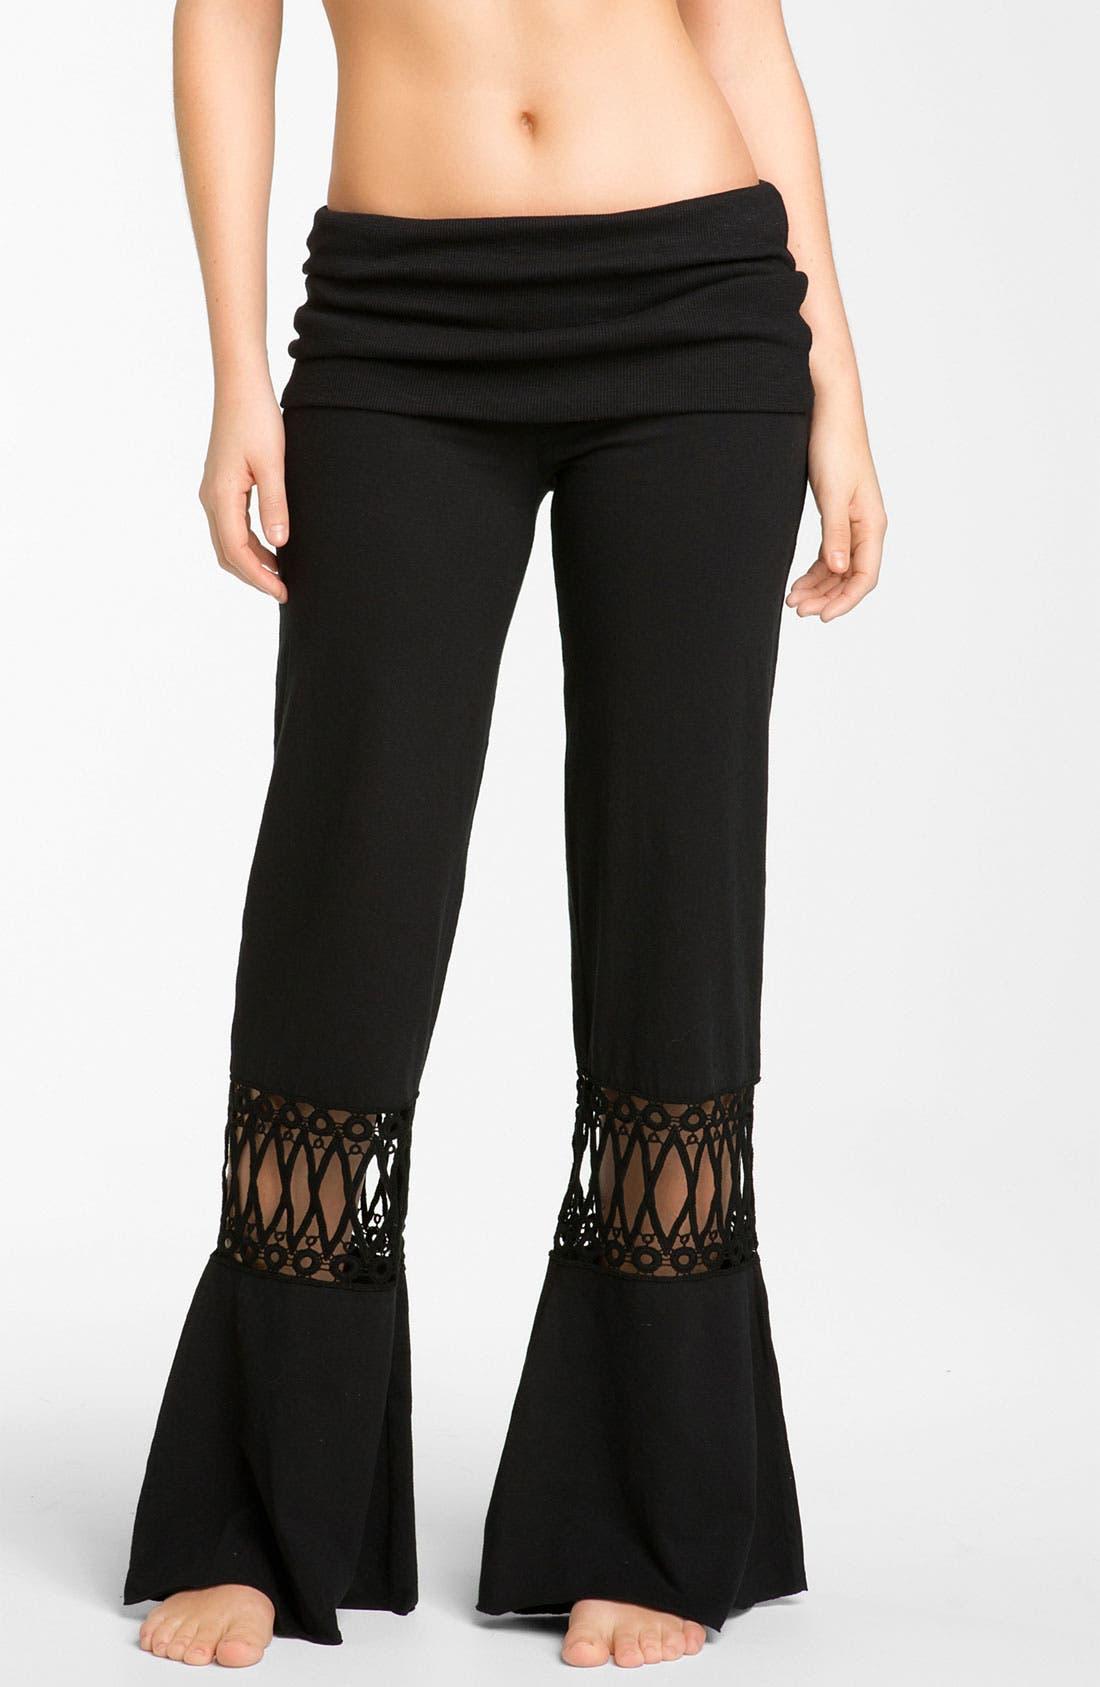 Alternate Image 1 Selected - prAna 'Malibu' Crochet Detail Knit Pants